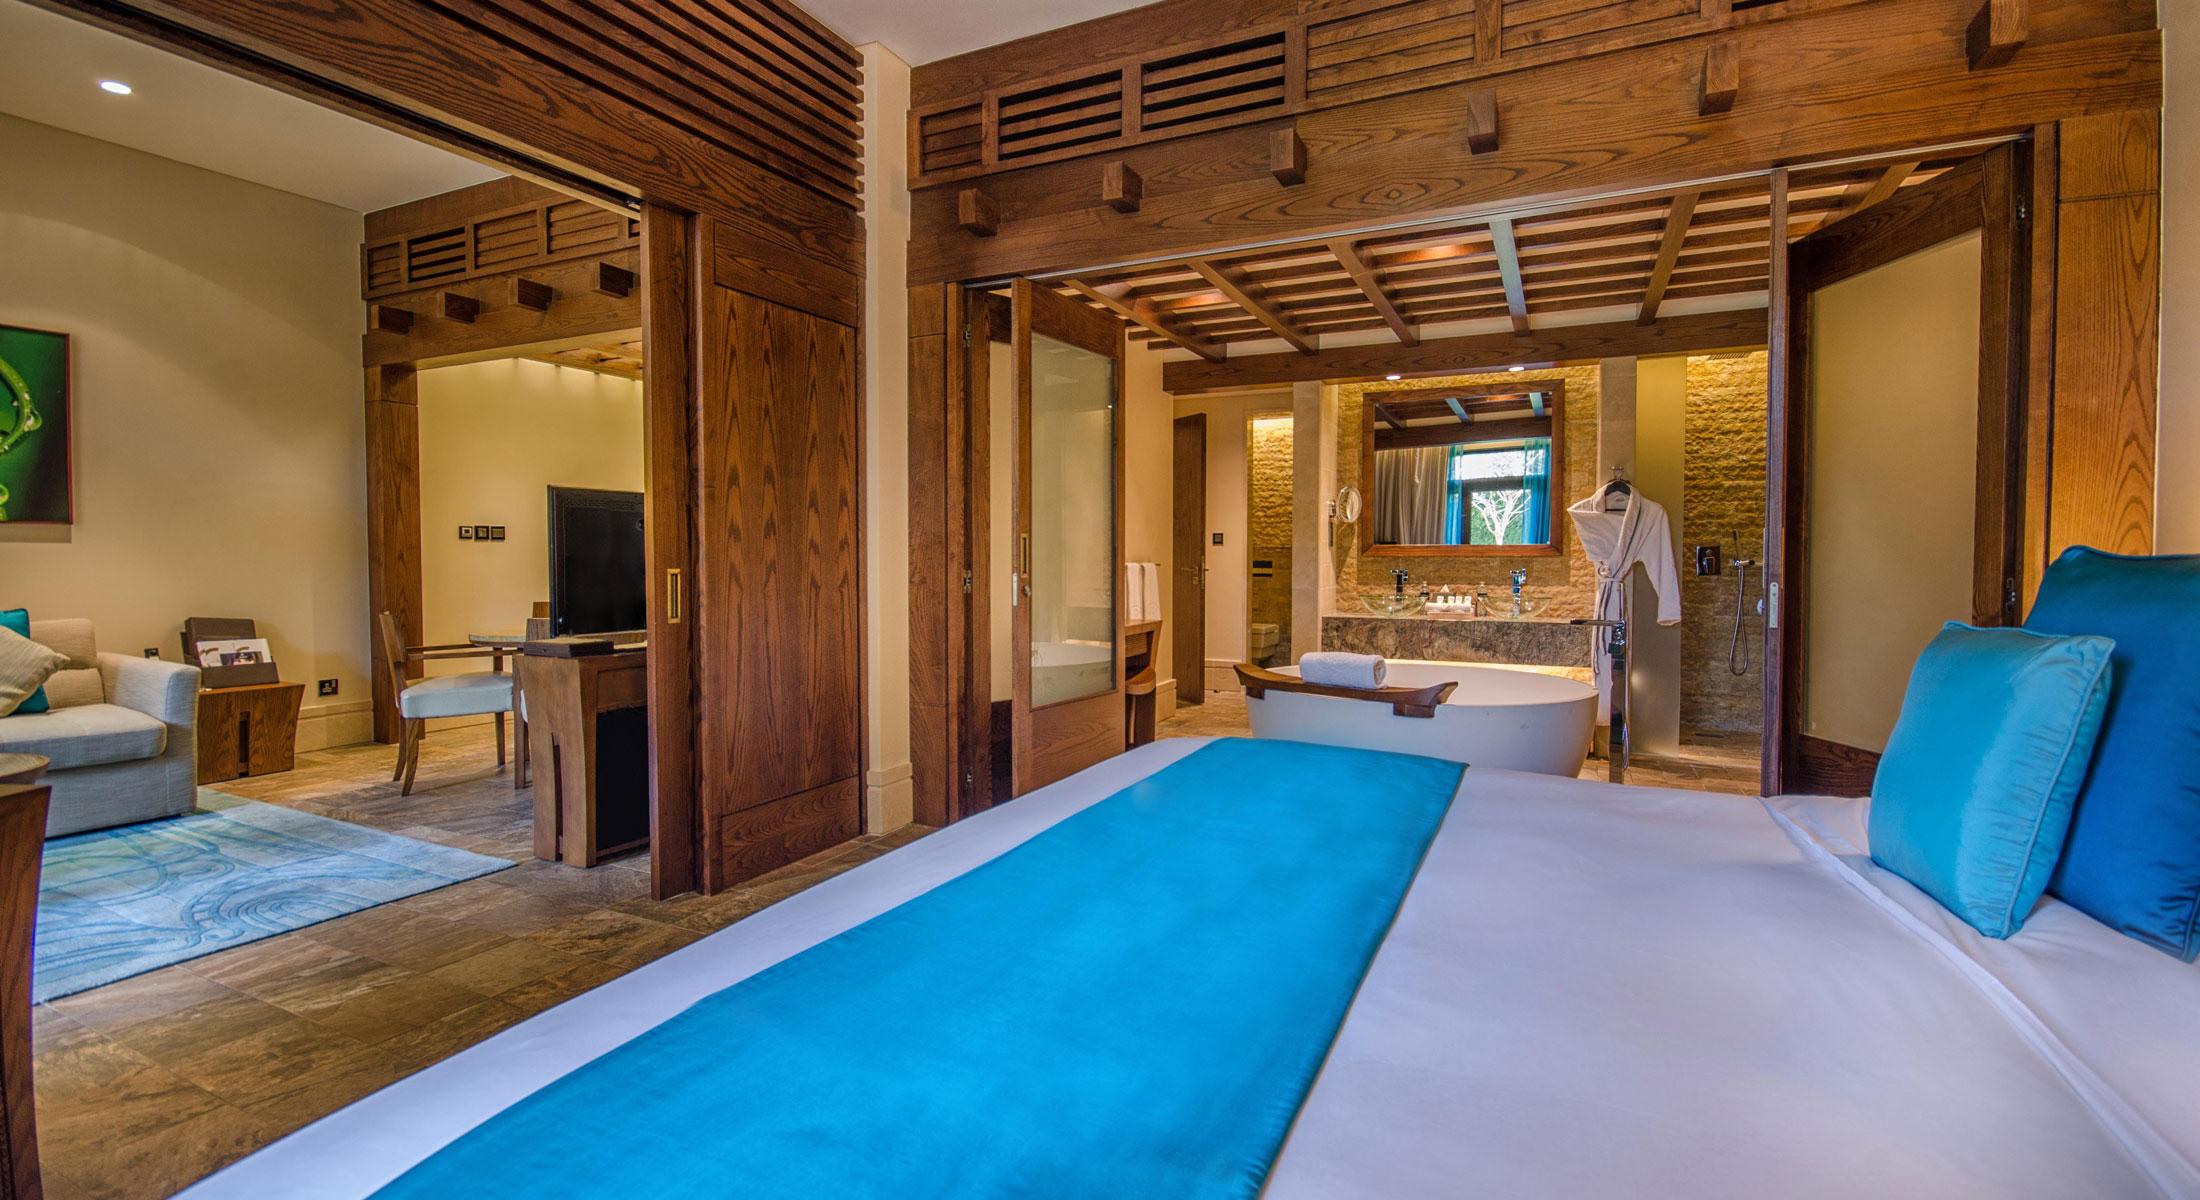 Strange 1 Bedroom Apartment Sofitel Dubai The Palm Resort Spa Download Free Architecture Designs Embacsunscenecom